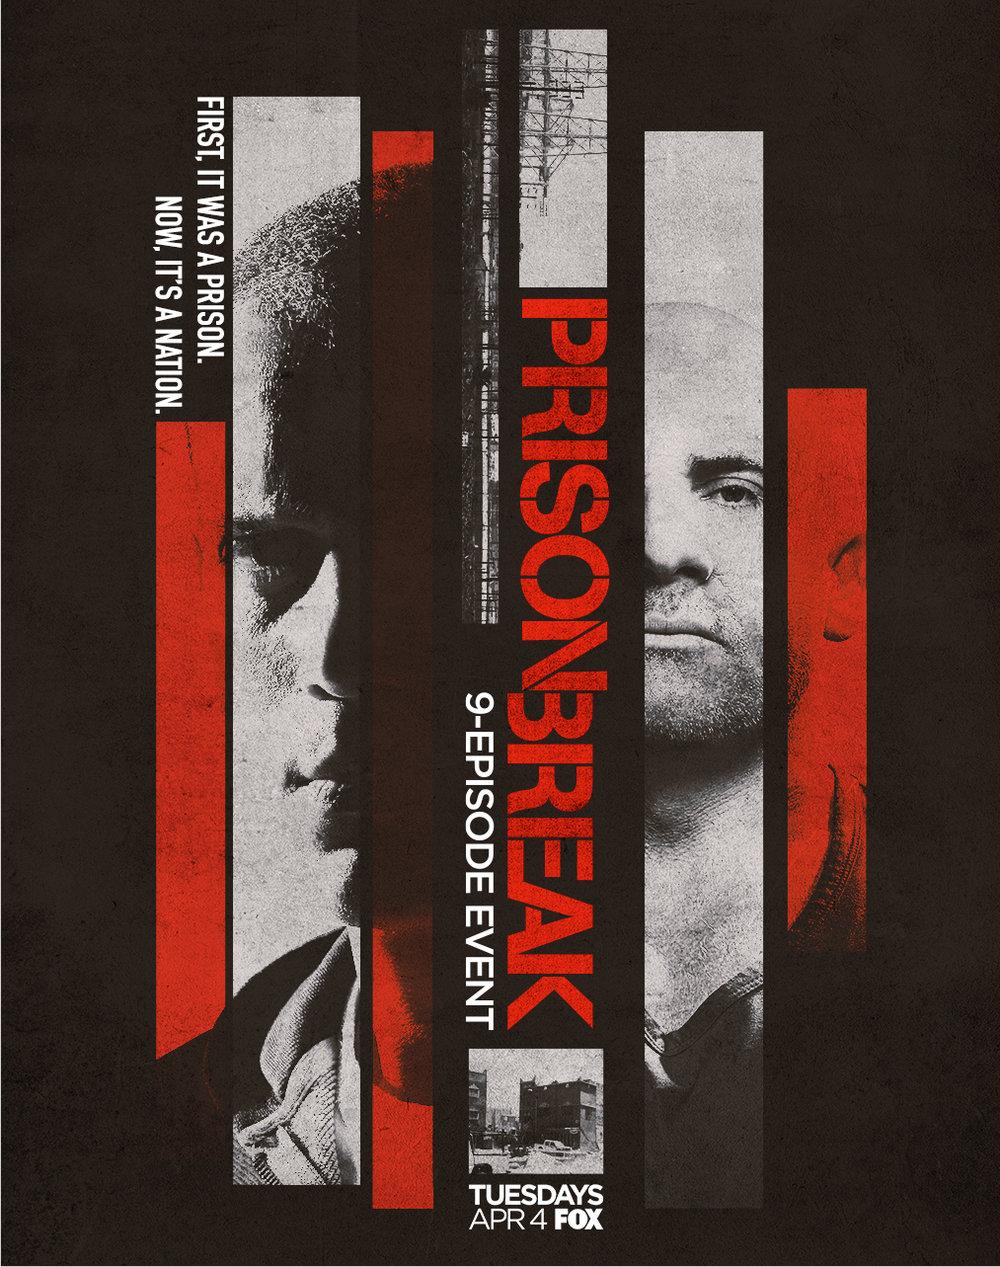 PrisonBreak_Poster_2_FB.jpg